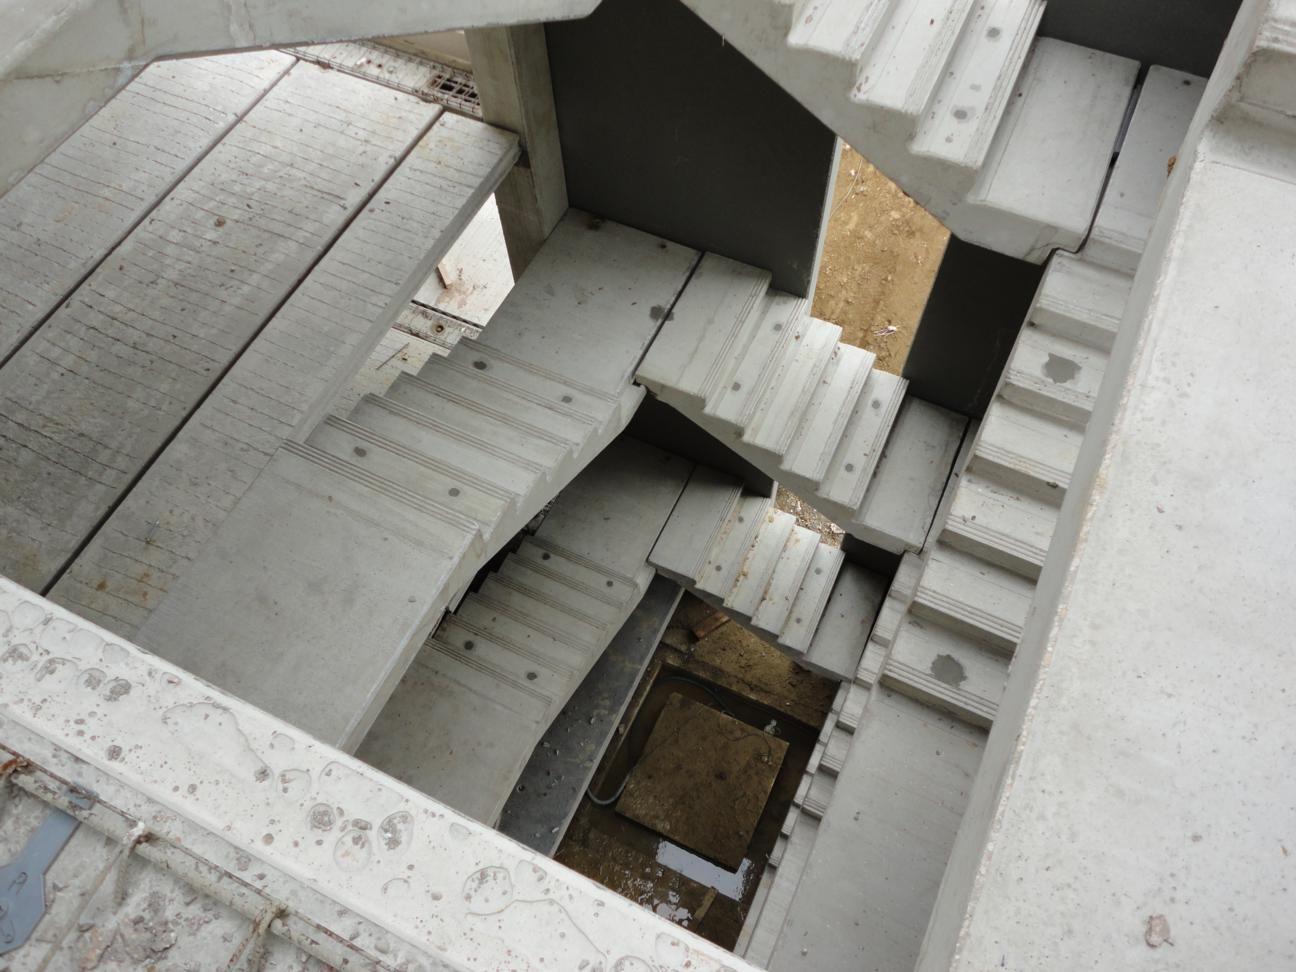 Escaleras de hormigon escaleras gilva s a varis pinterest - Escaleras de hormigon ...